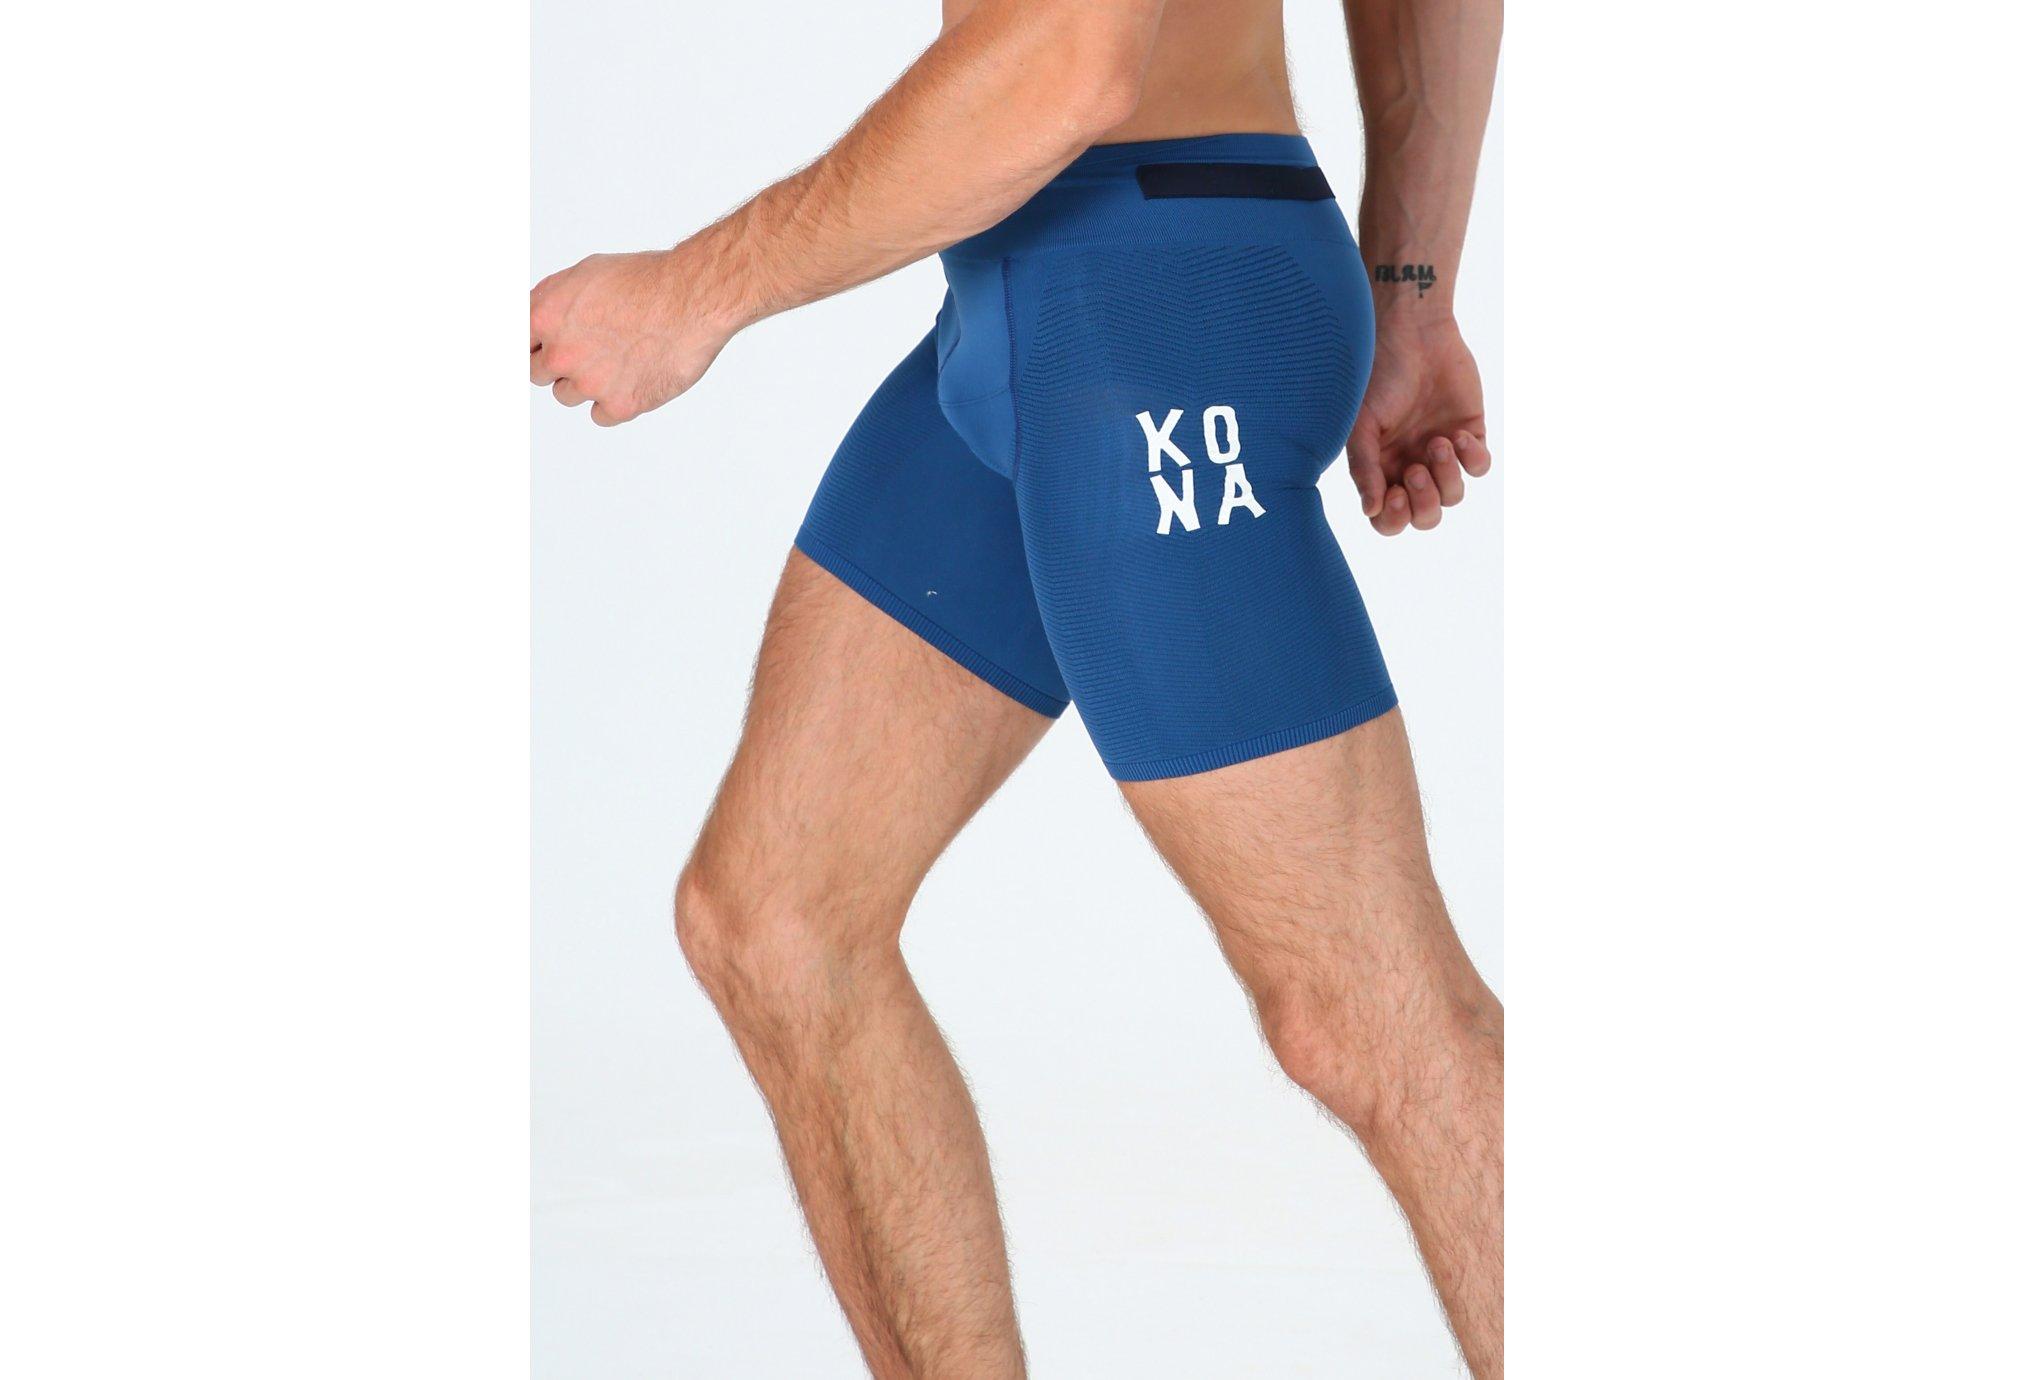 Compressport Oxygen Under Control Kona 2019 M vêtement running homme